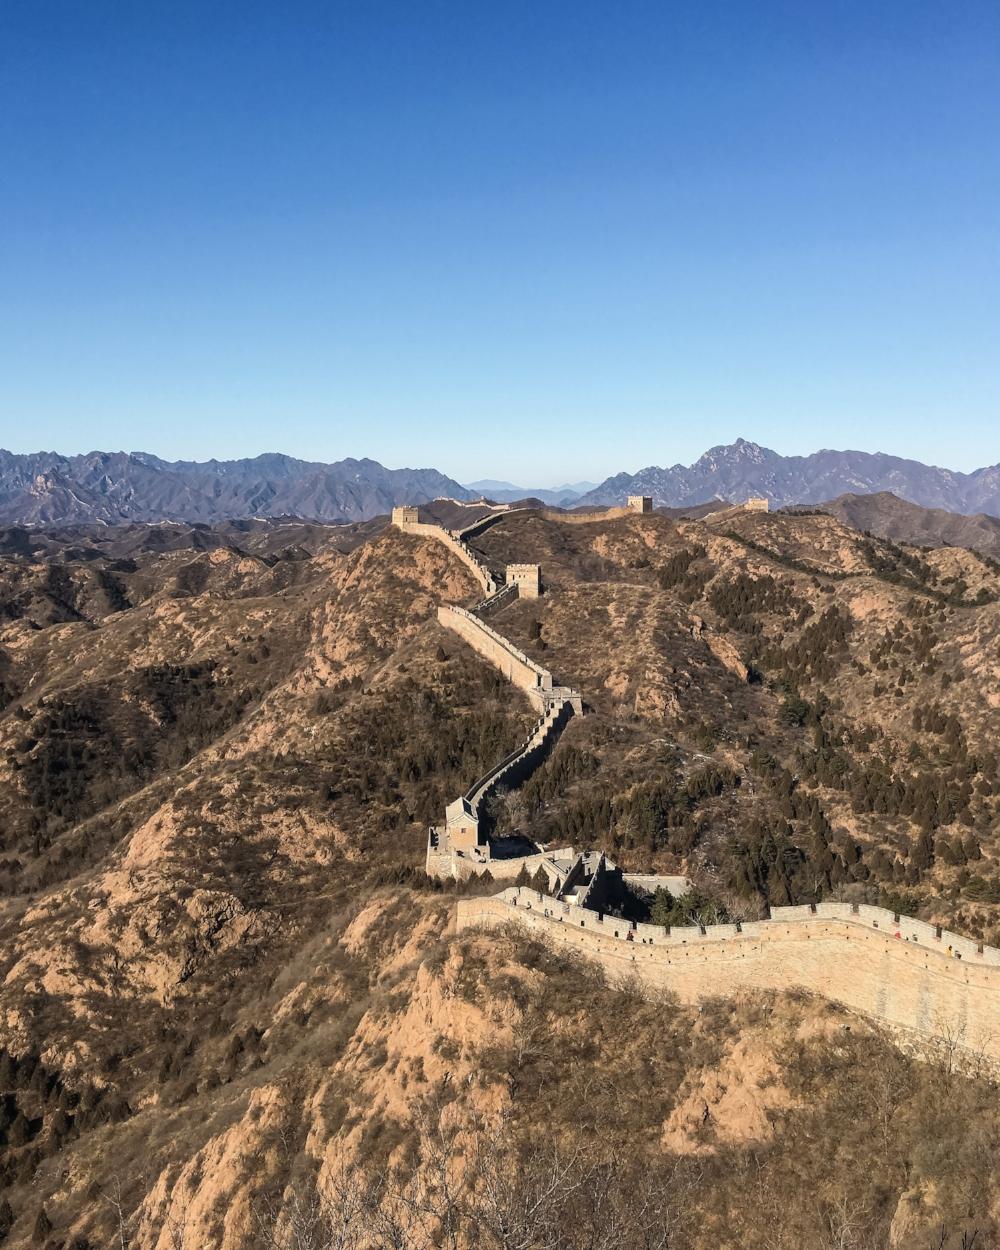 curio.trips.china.beijing.great.wall.of.china.view-2.jpg